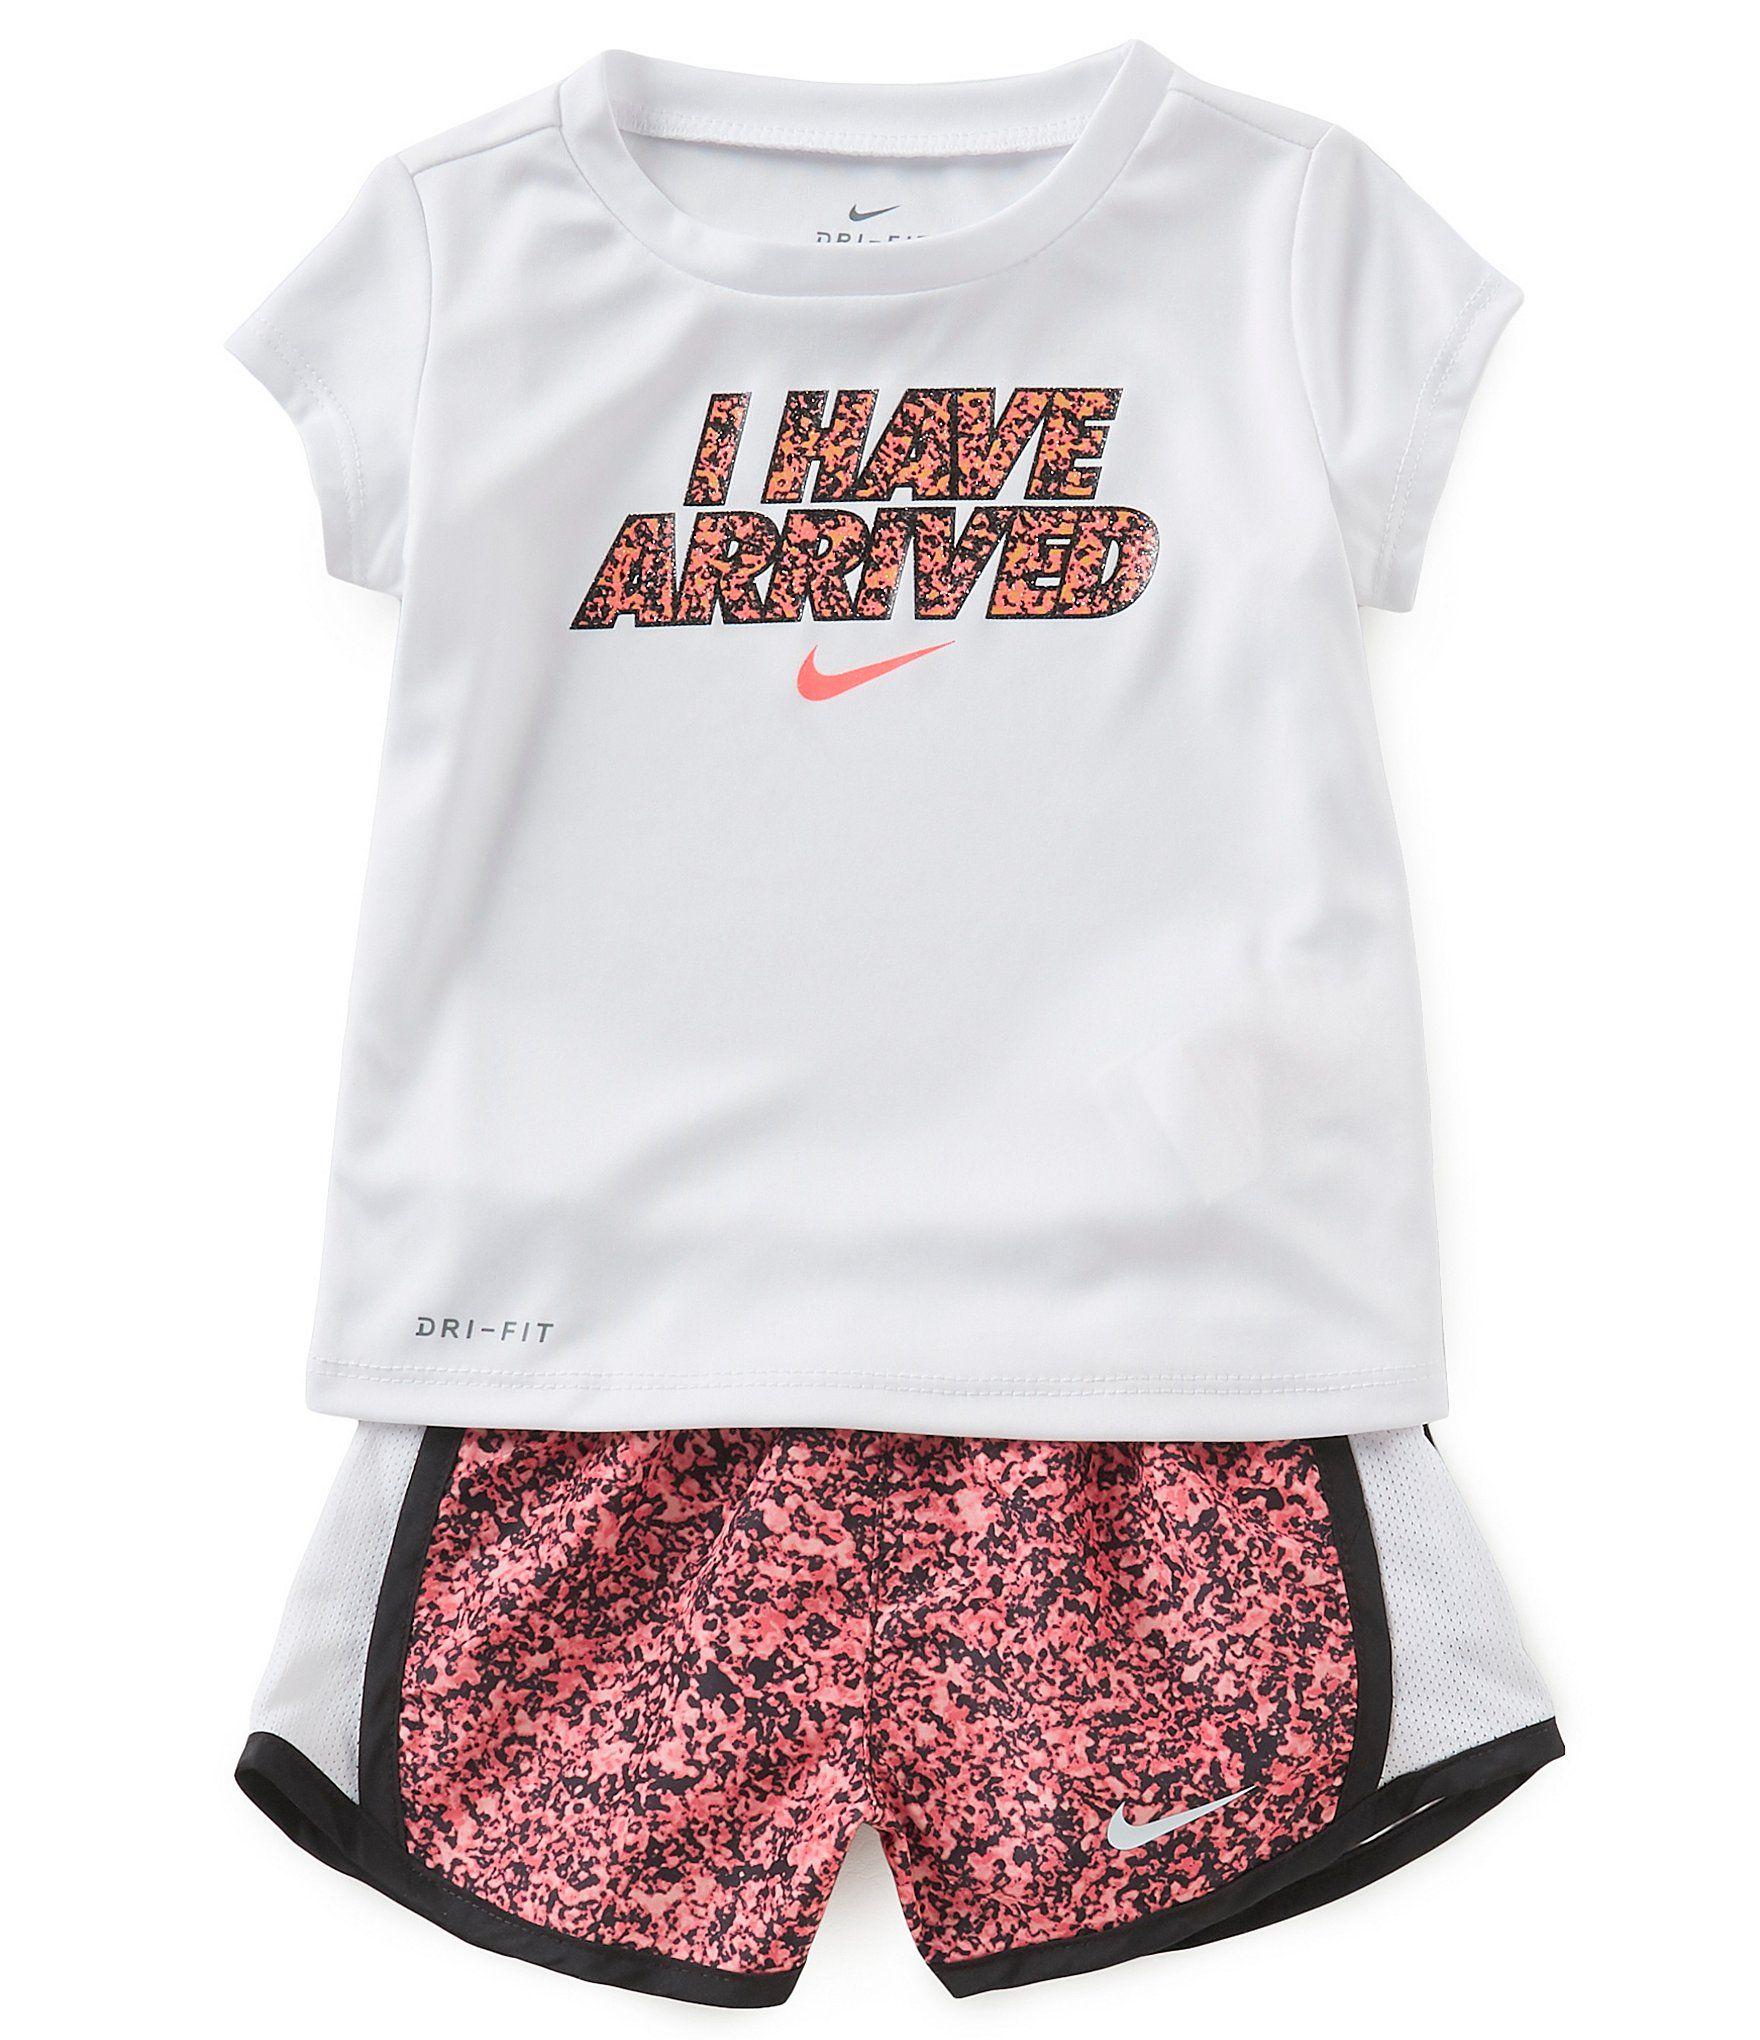 4e18c78d73 Shop for Nike Baby Girls 12-24 Months Short-Sleeve I Have Arrived Tee &  Sublimation-Printed Short Set at Dillards.com. Visit Dillards.com to find  clothing, ...